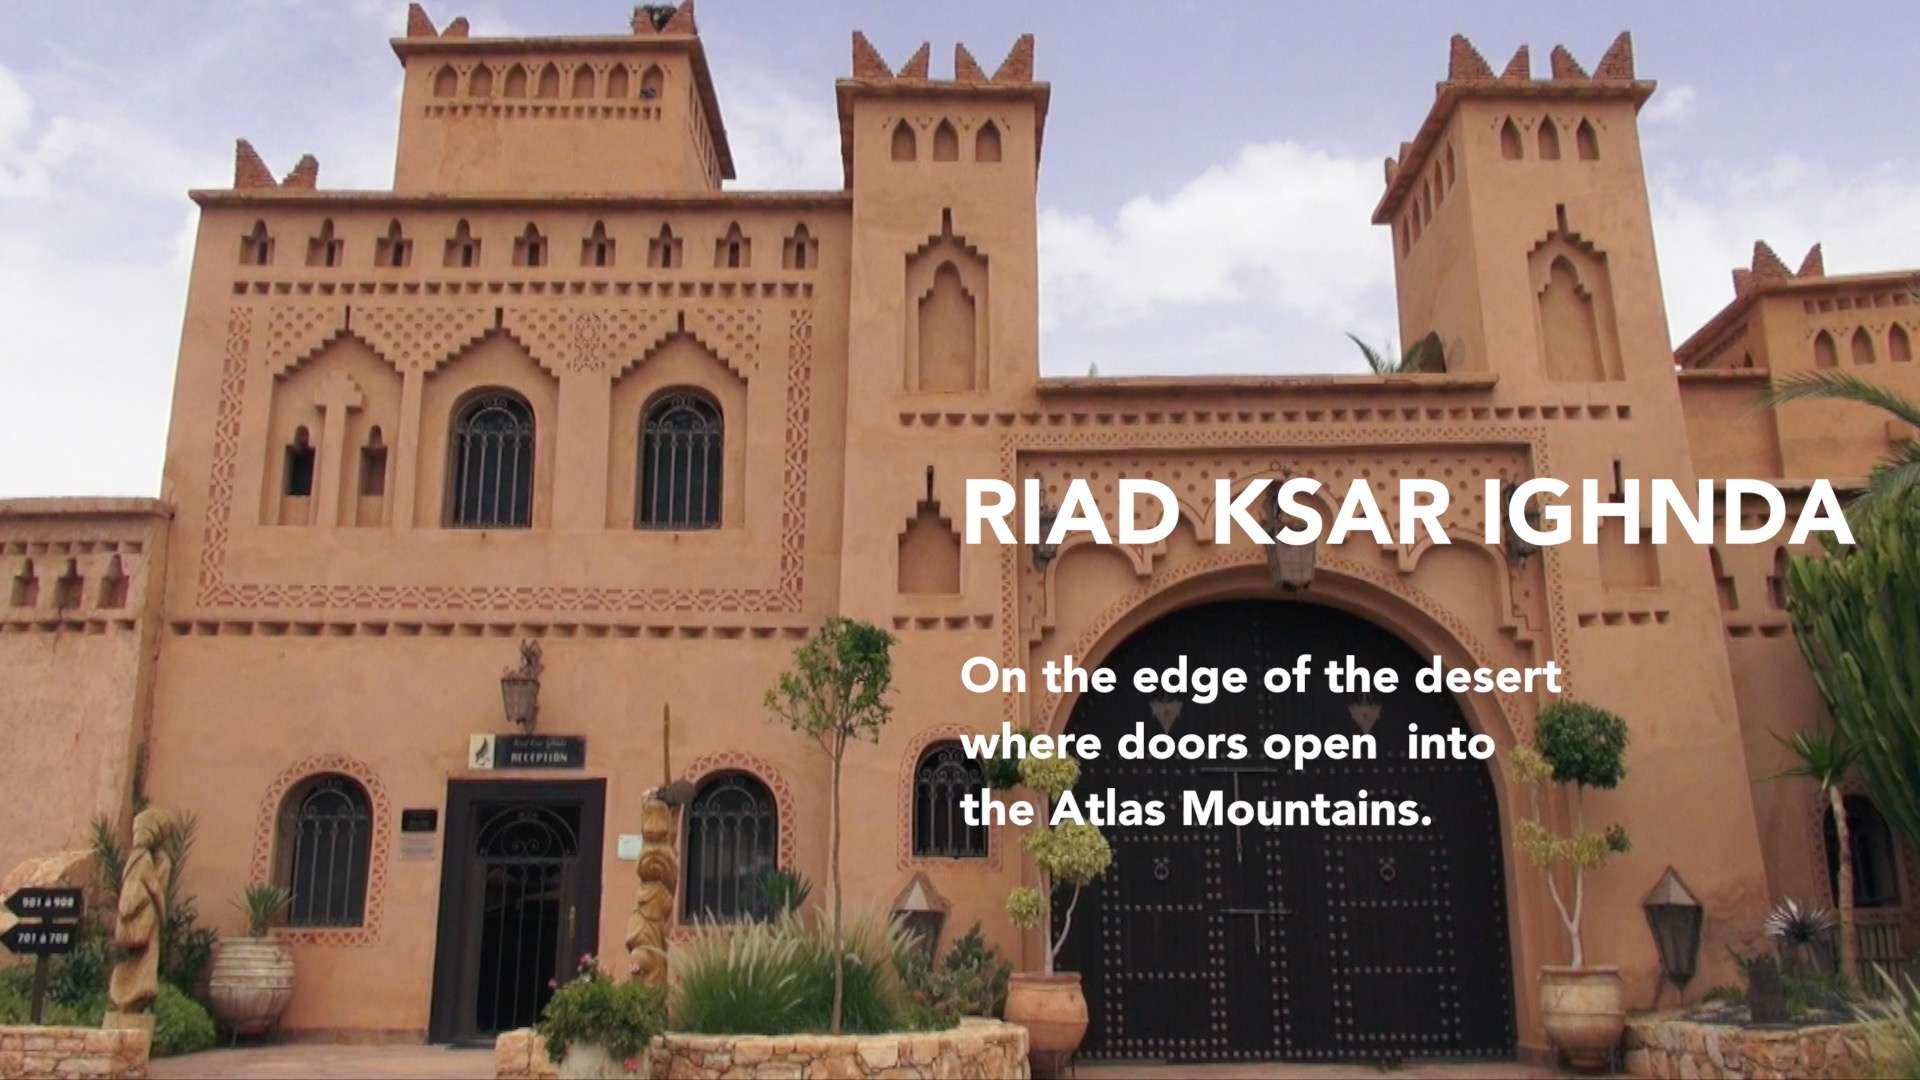 Road to Desert • Morocco Riad Ksar Ighnda